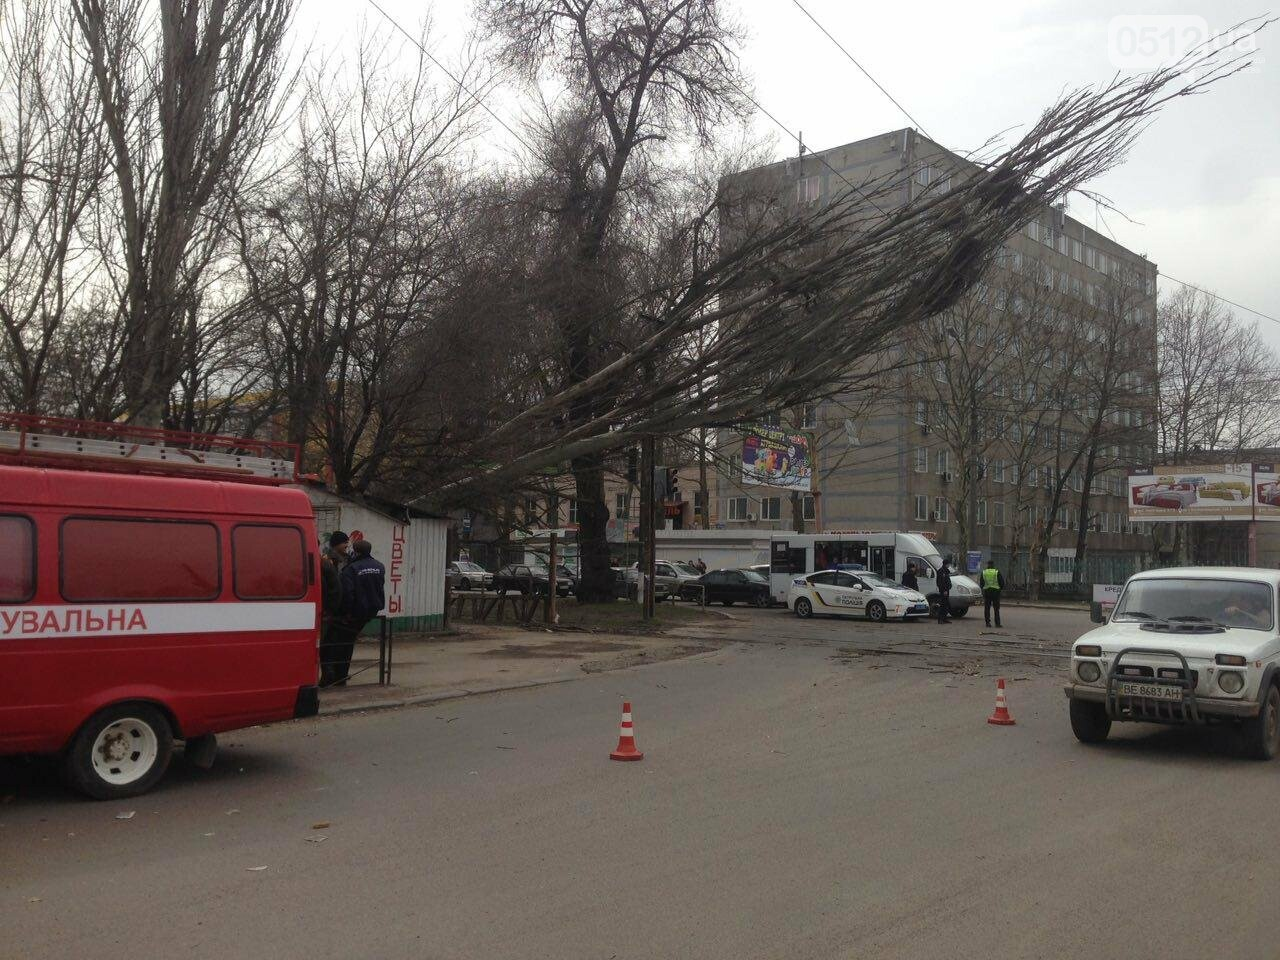 В Николаеве из-за сильного ветра дерево упало на дорогу и задело провода, - ФОТО, фото-3